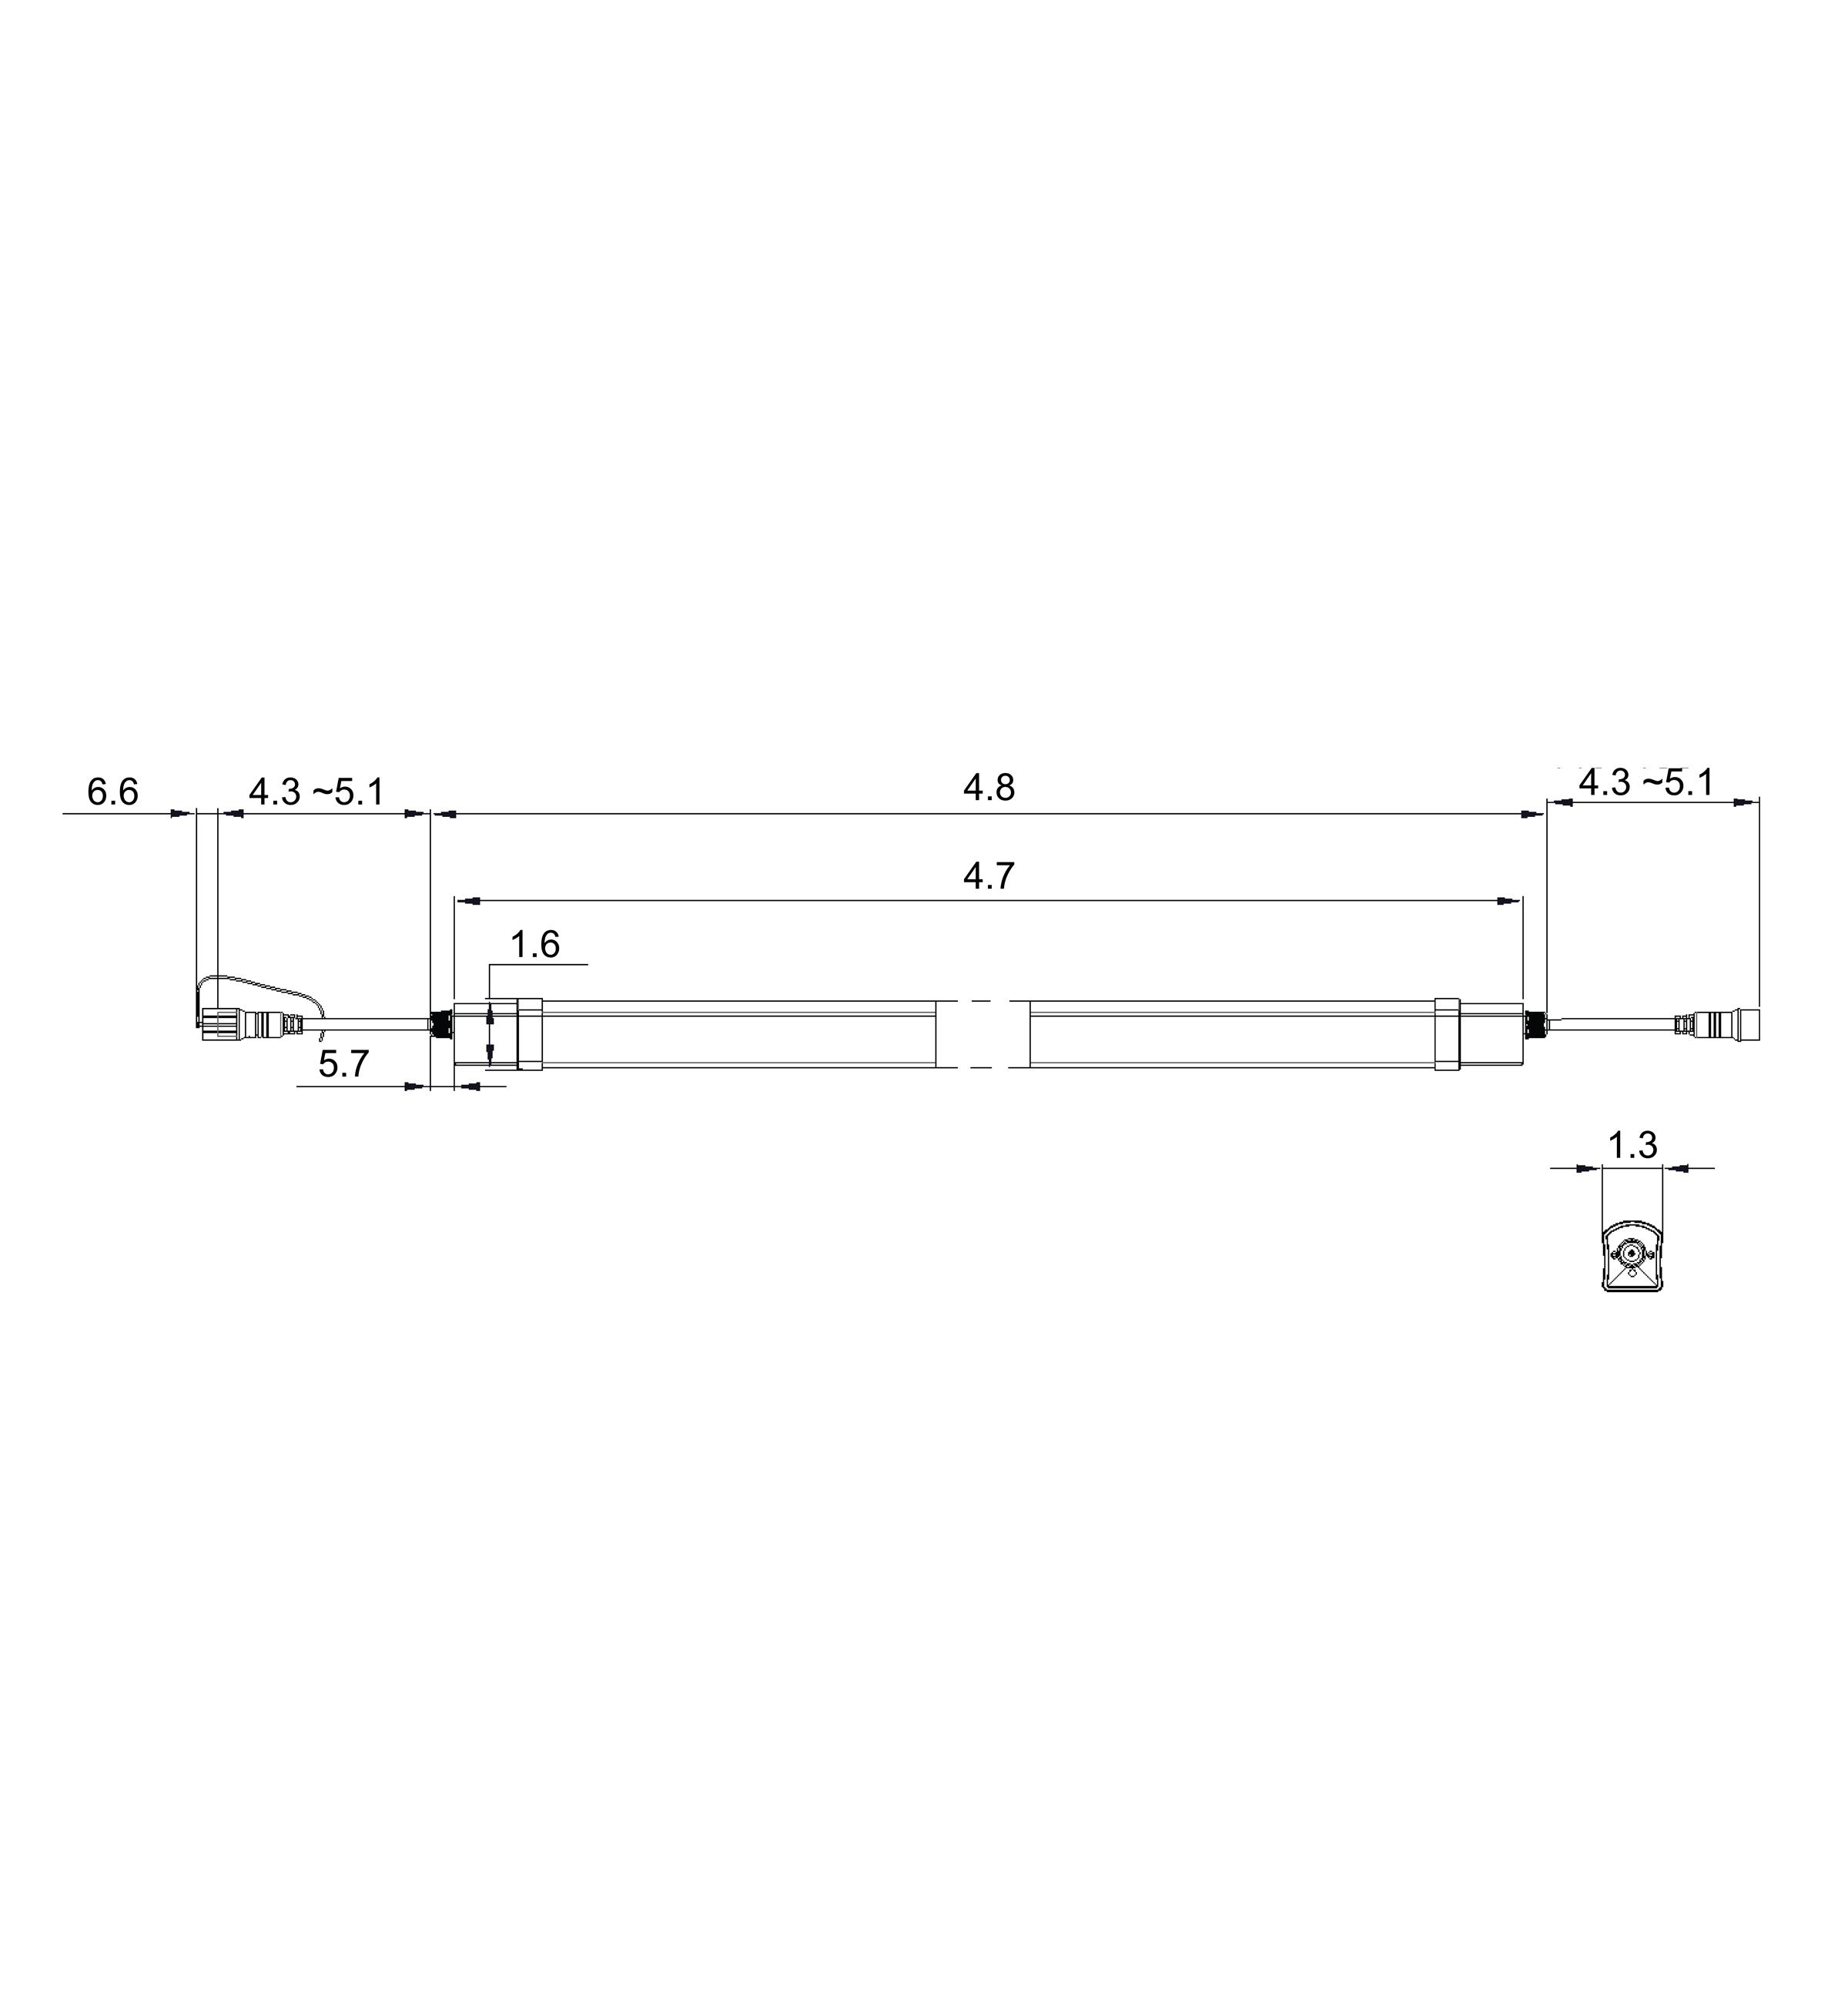 TG-30HVR-Lighting-Dimensions